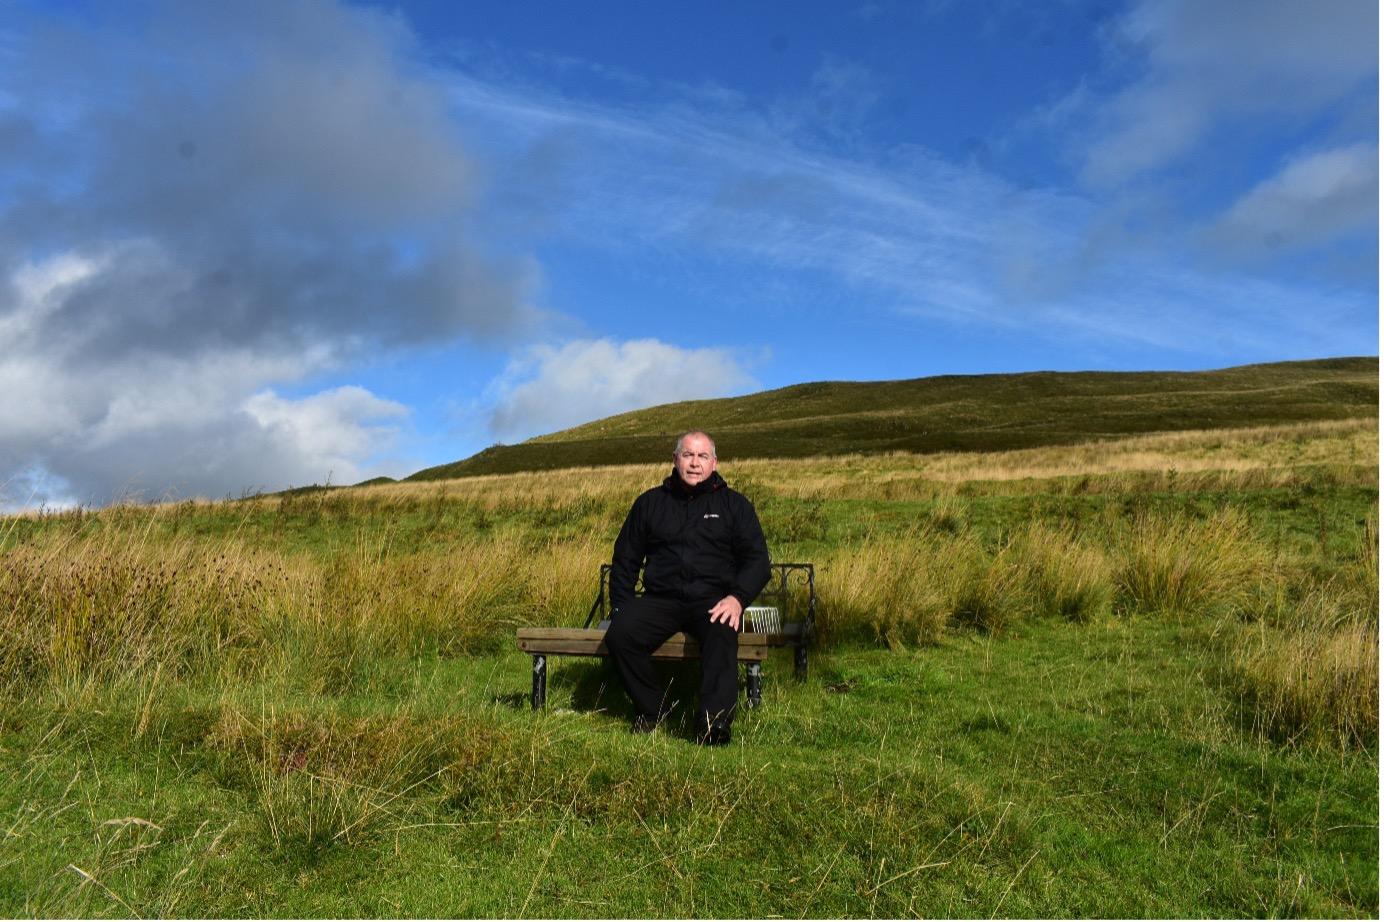 Man sitting on a bench on a hillside